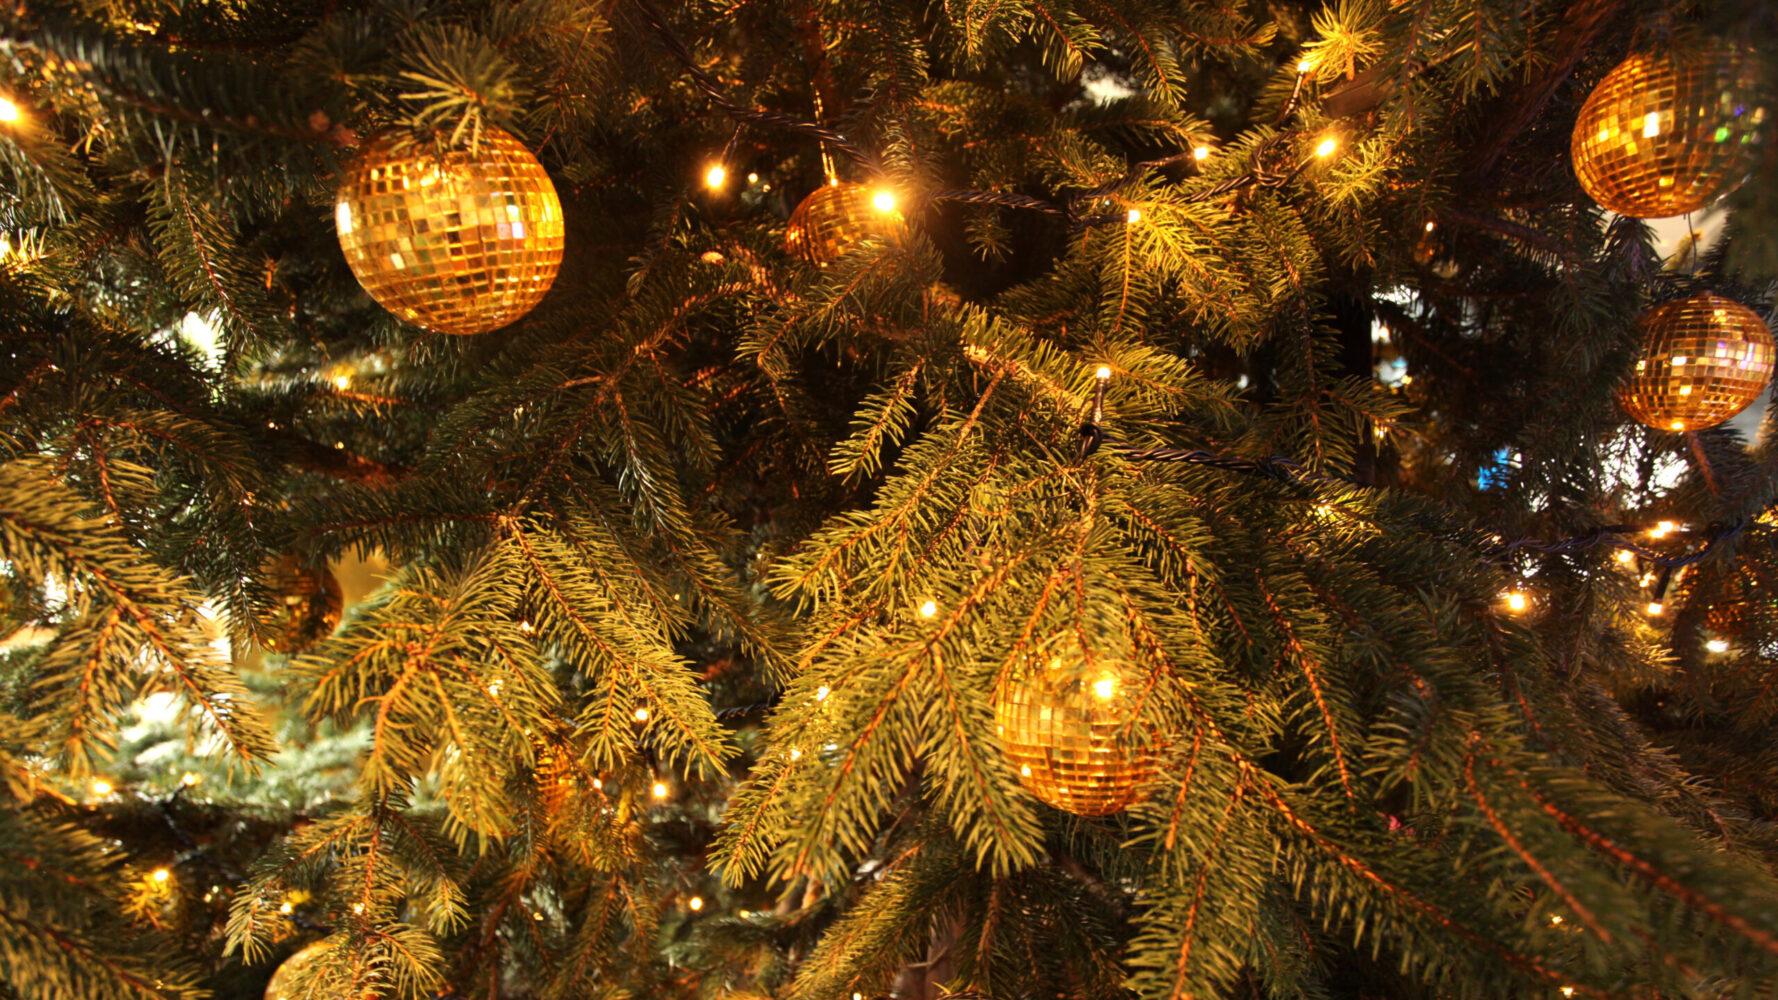 (marunouchi) HOUSE Christmas display 事例画像9